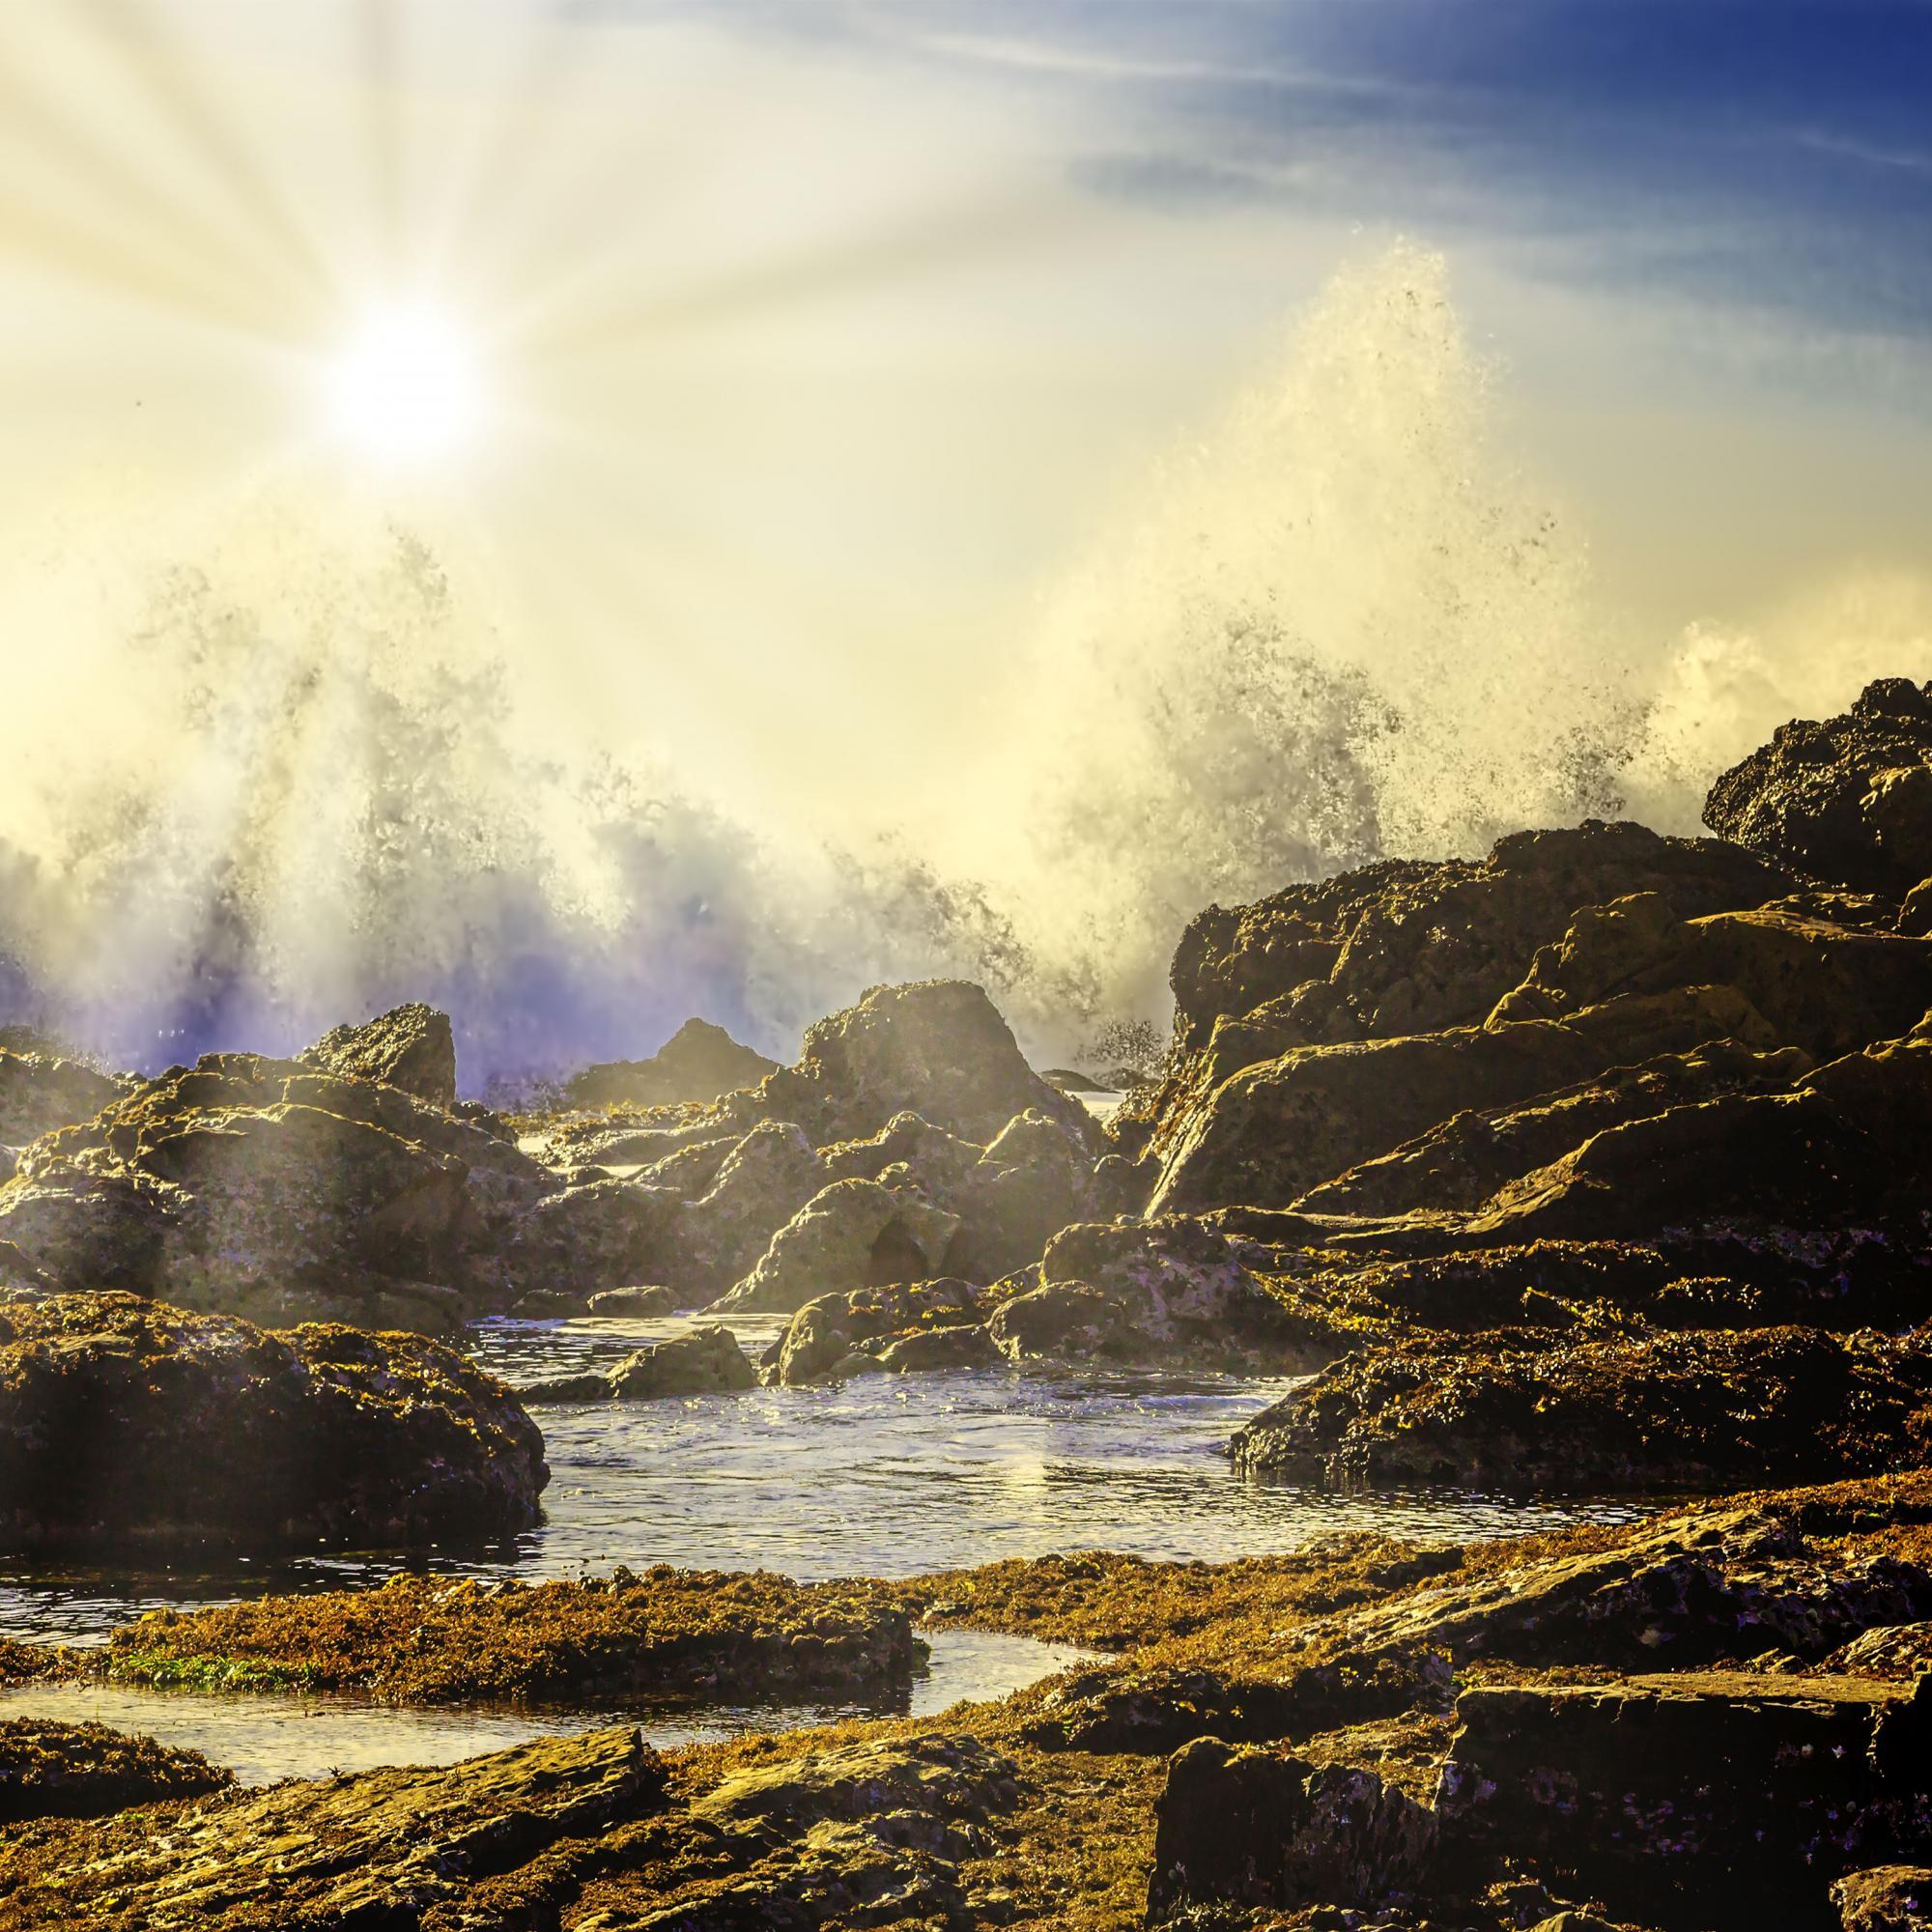 Dan Blackburn Roaring Waves Point Lobos Park Big Sur California_MGL1894